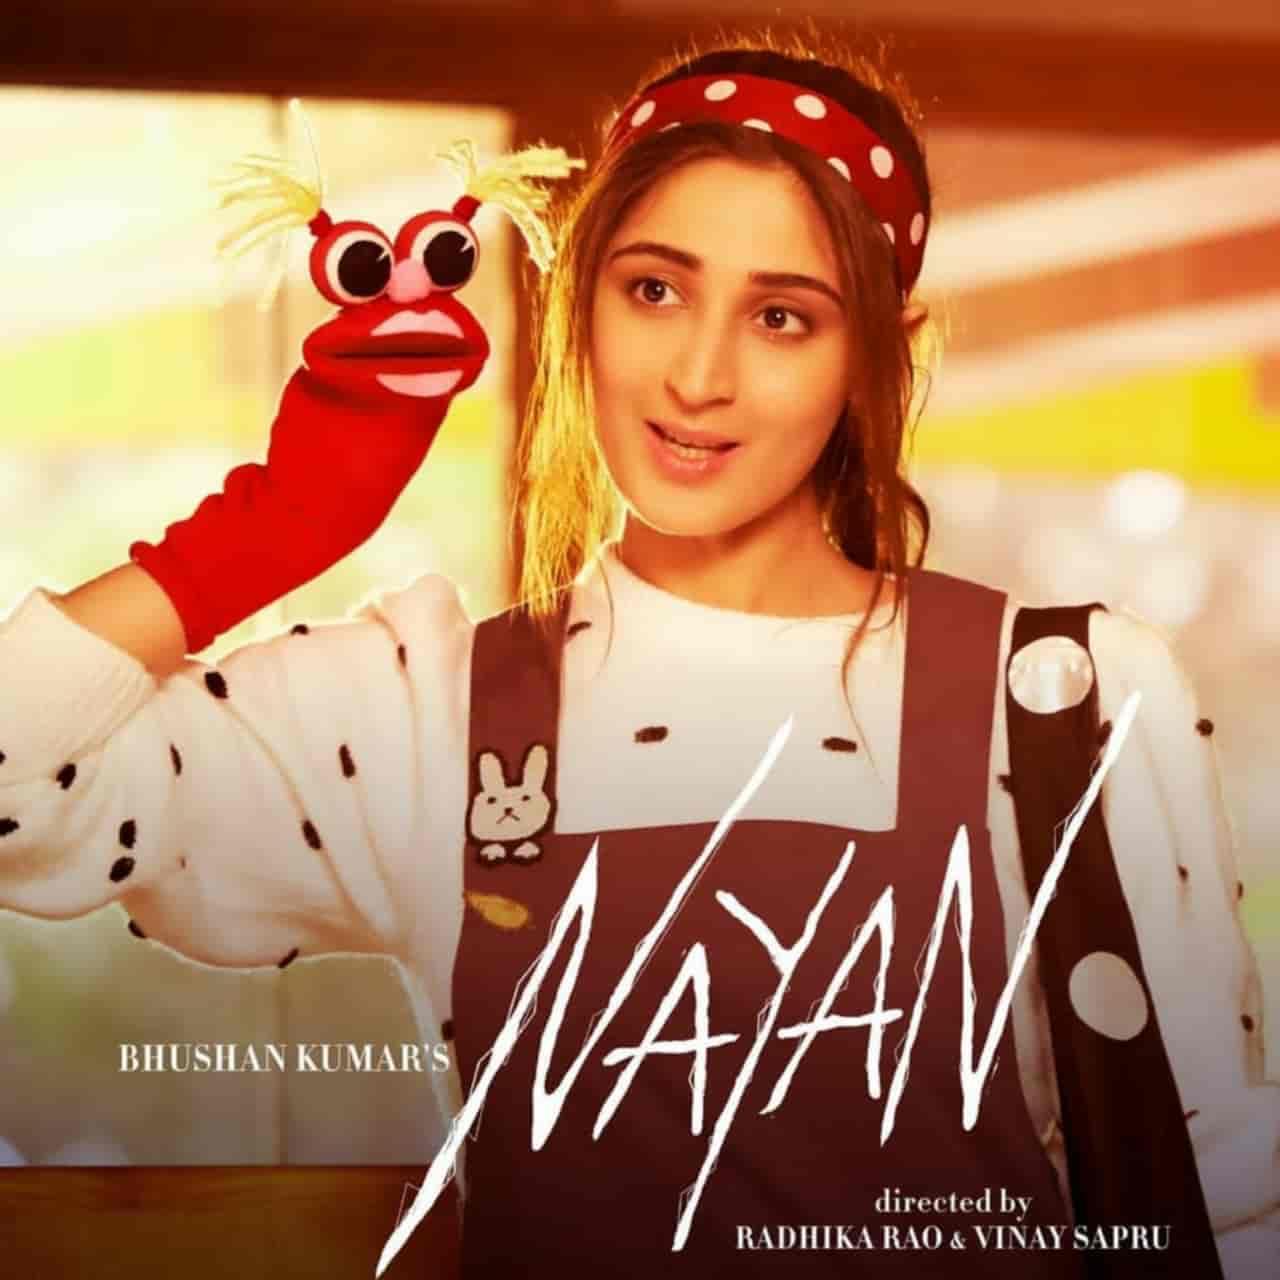 Nayan Love Song Lyrics, Sung By Jubin Nautiyal and Dhvani Bhanushali.